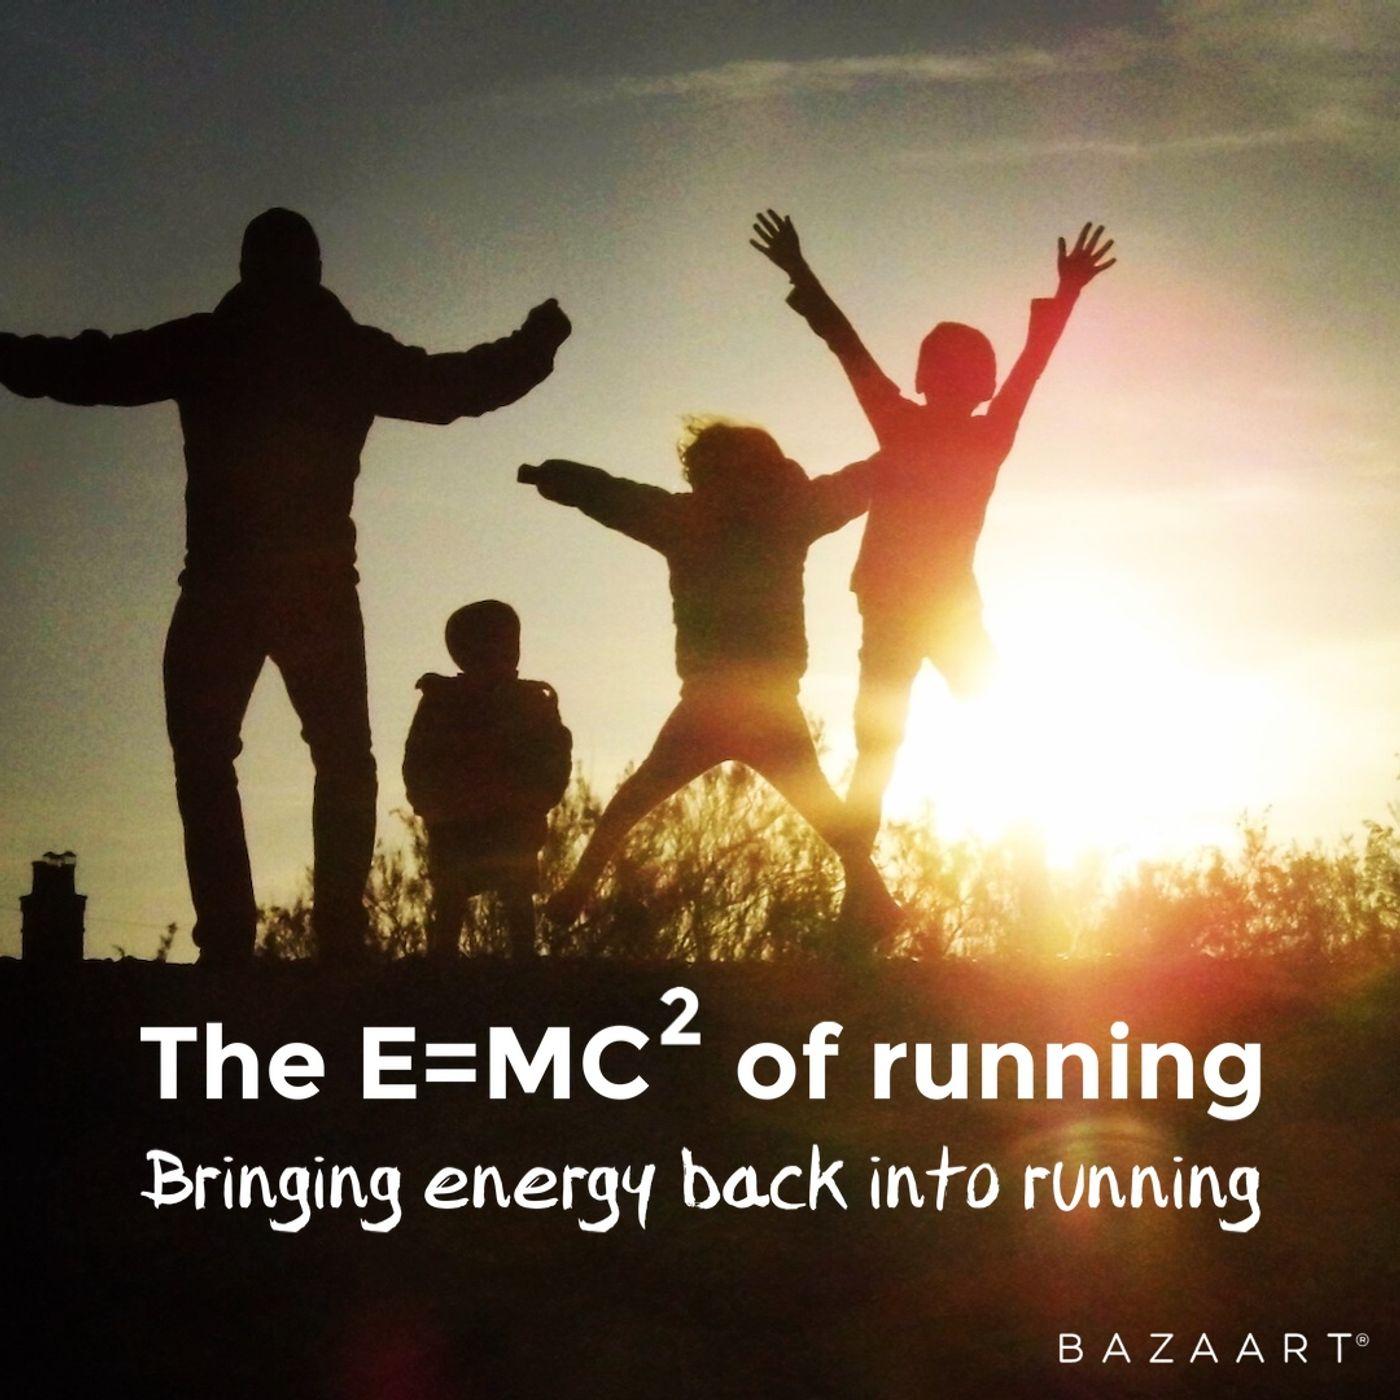 The E=MC2 of running